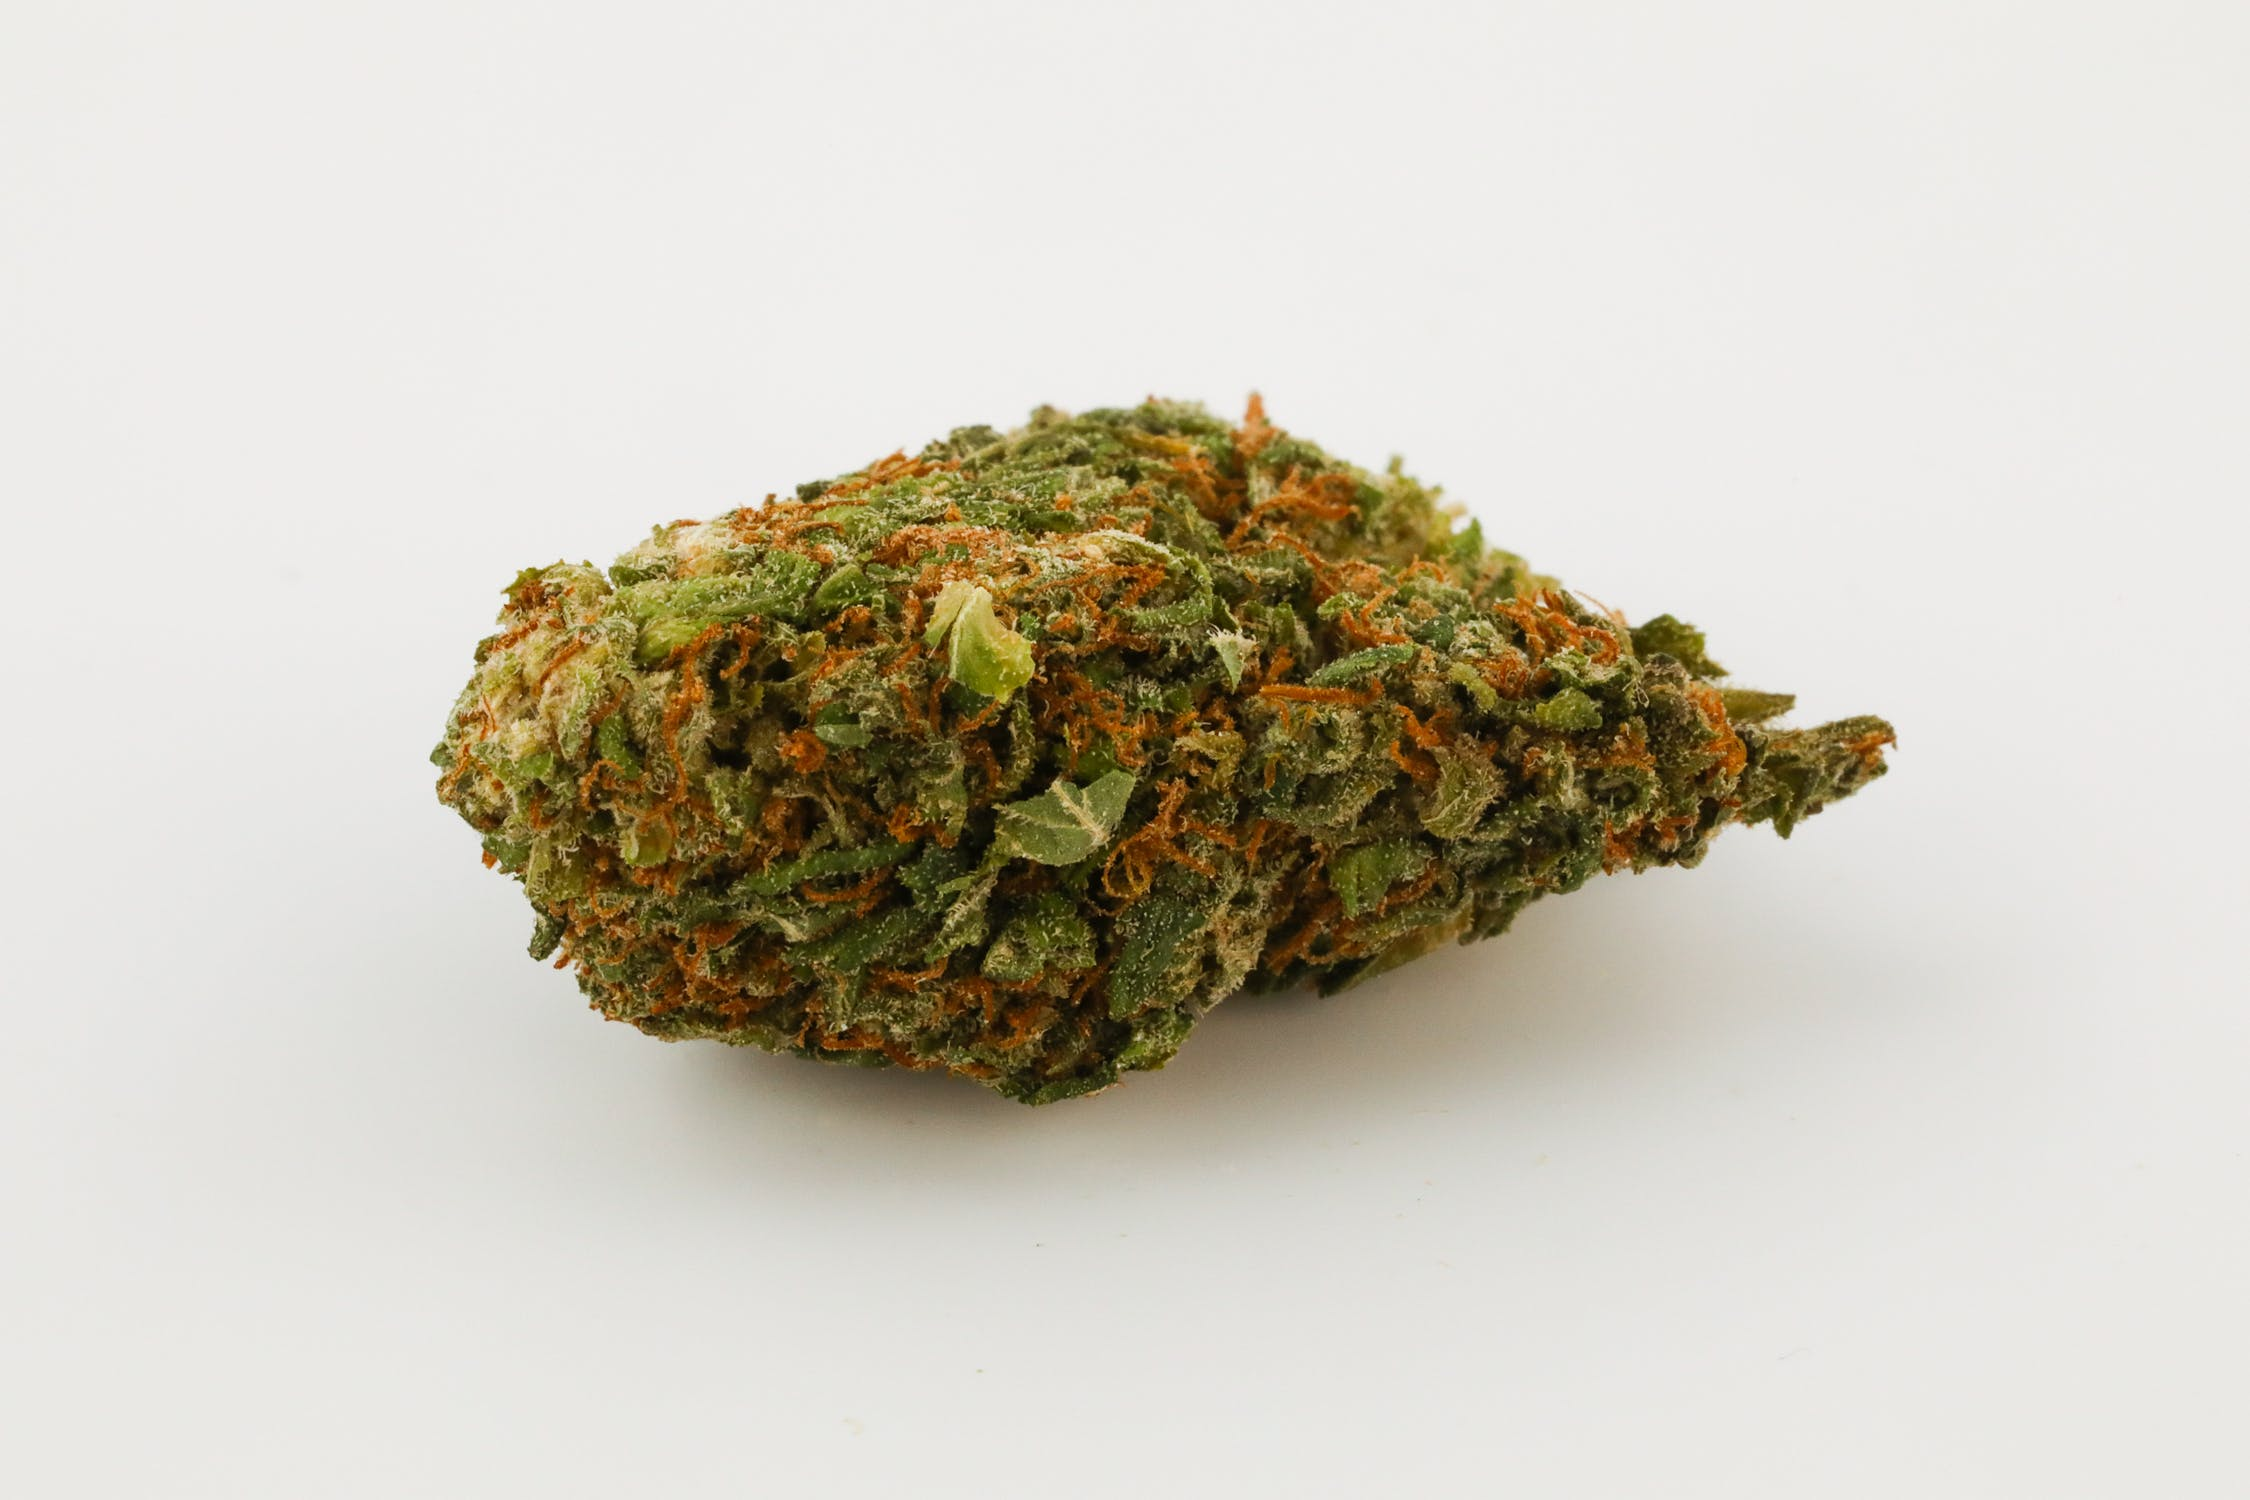 Confidential Cheese Weed; Confidential Cheese Cannabis Strain; Confidential Cheese Hybrid Marijuana Strain